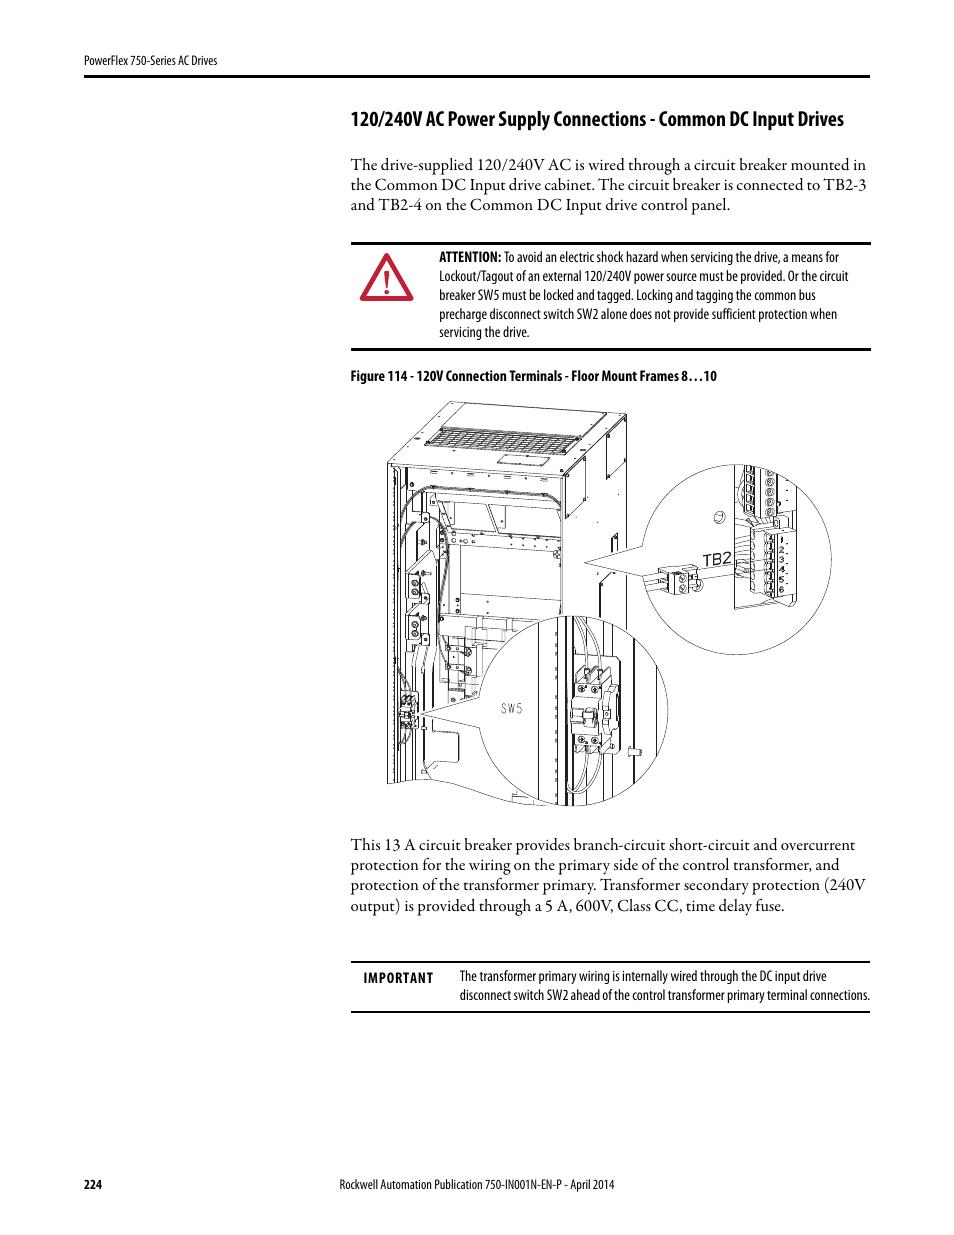 Rockwell Automation 21G PowerFlex 750-Series AC Drives User Manual ...